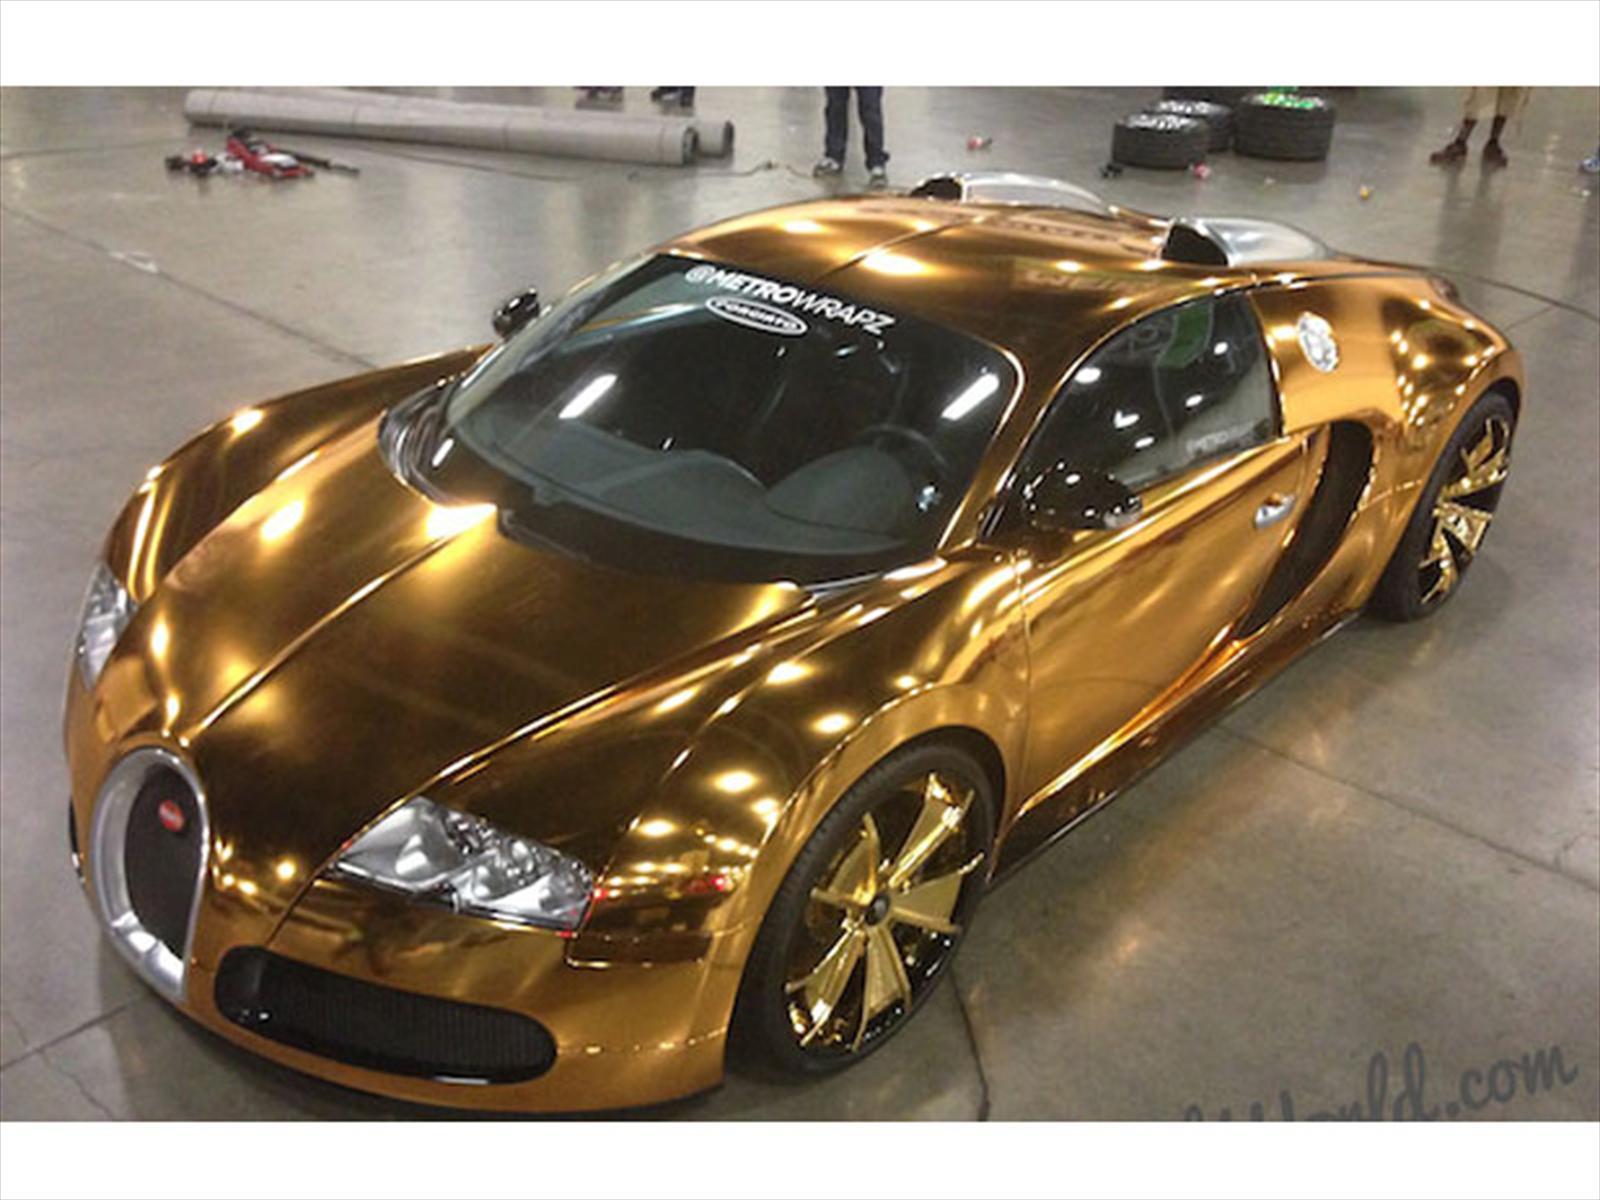 Mustang Dorado >> Rapero Flo Rida viste de oro su Bugatti Veyron - Autocosmos.com